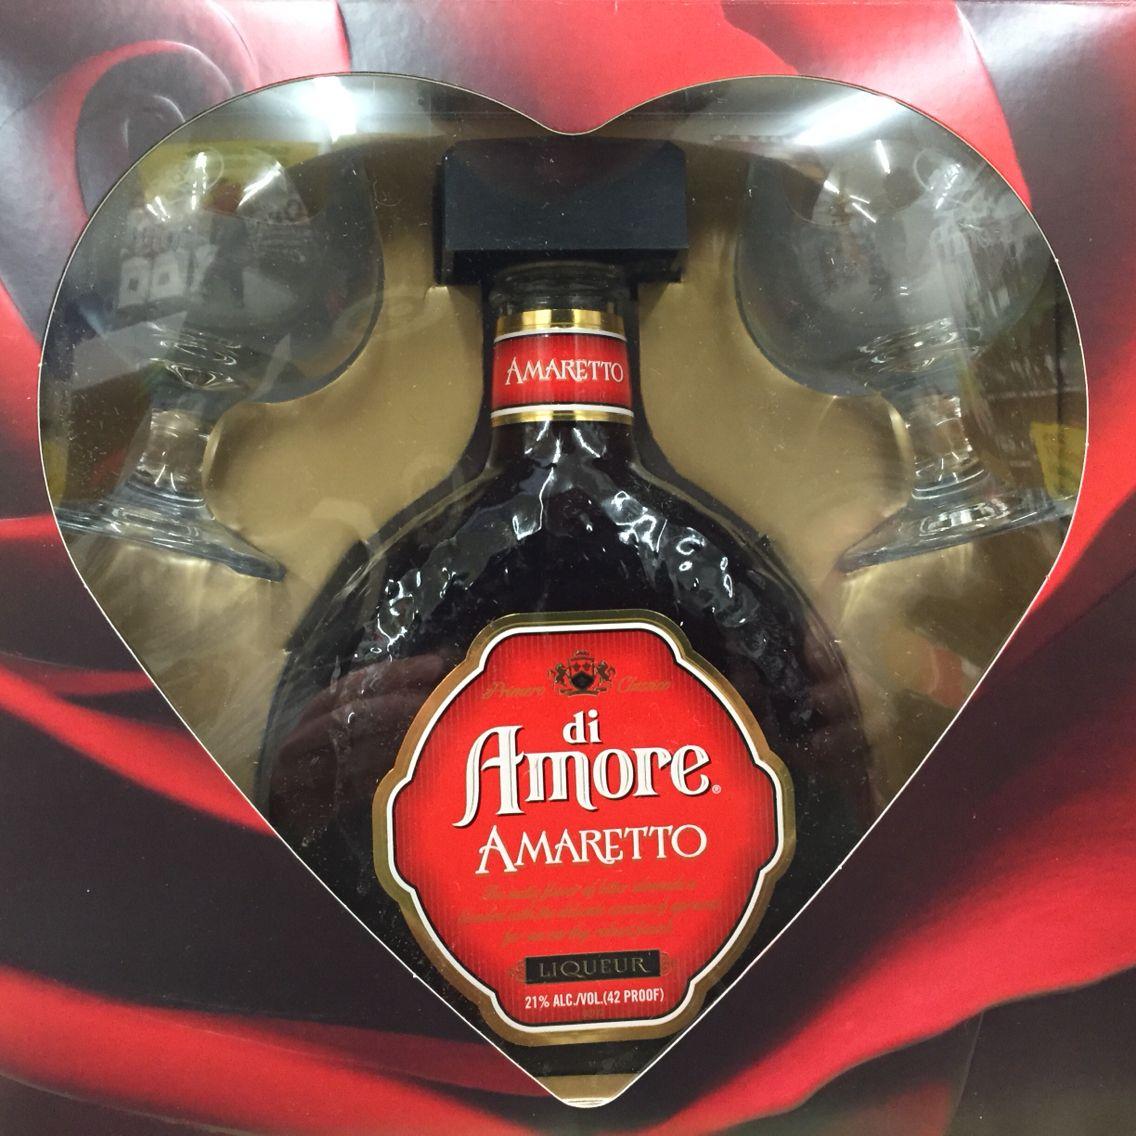 Di Amore Amaretto Gift Pack Whiskey Bottle Bottle Spray Bottle